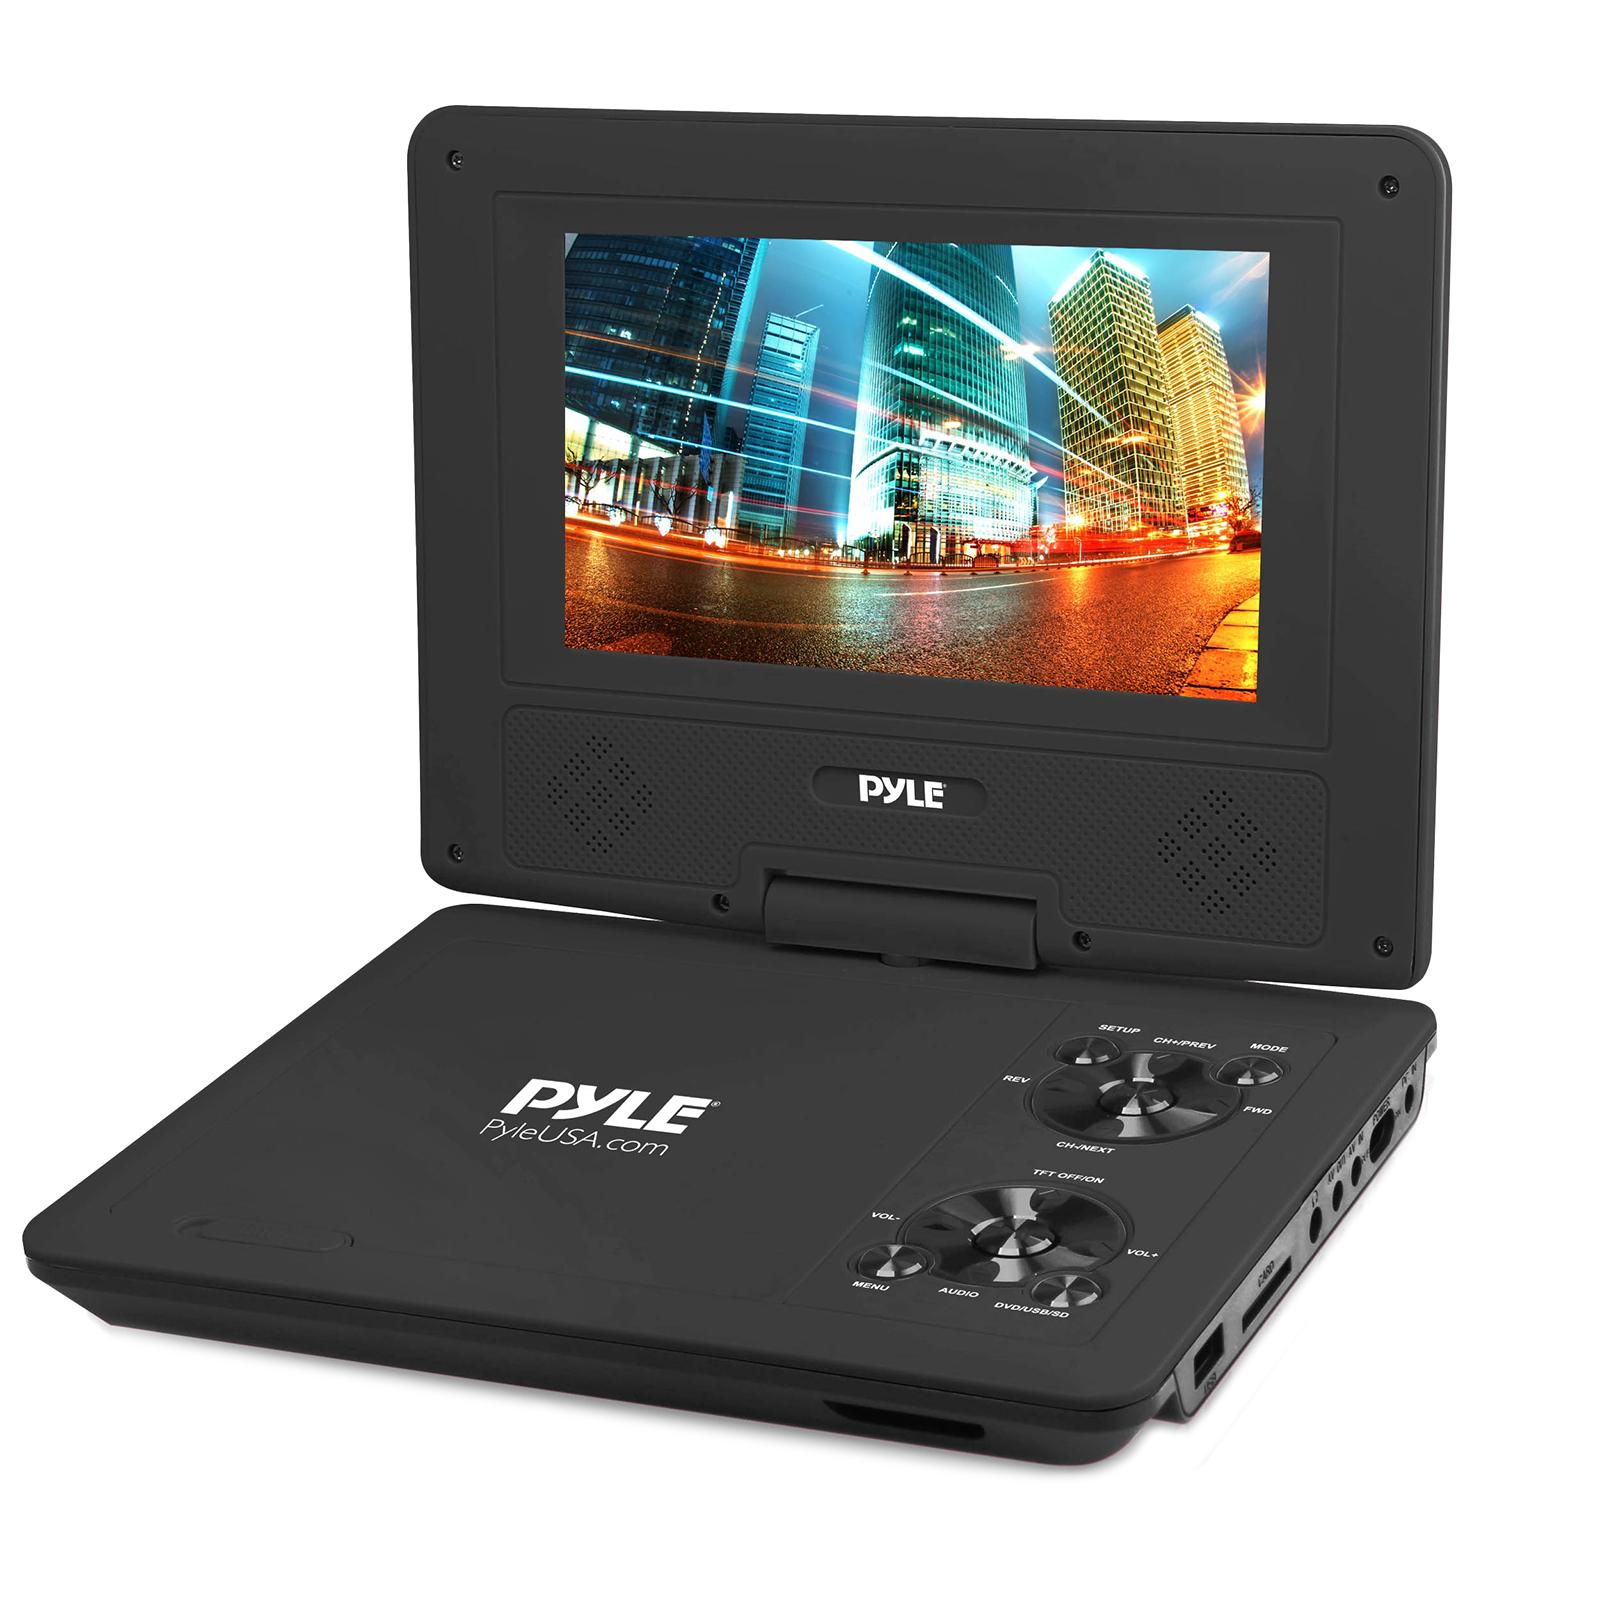 "9"" Portable CD/DVD Player, Built-in Battery, USB/SD Card Memory Readers (Black)"